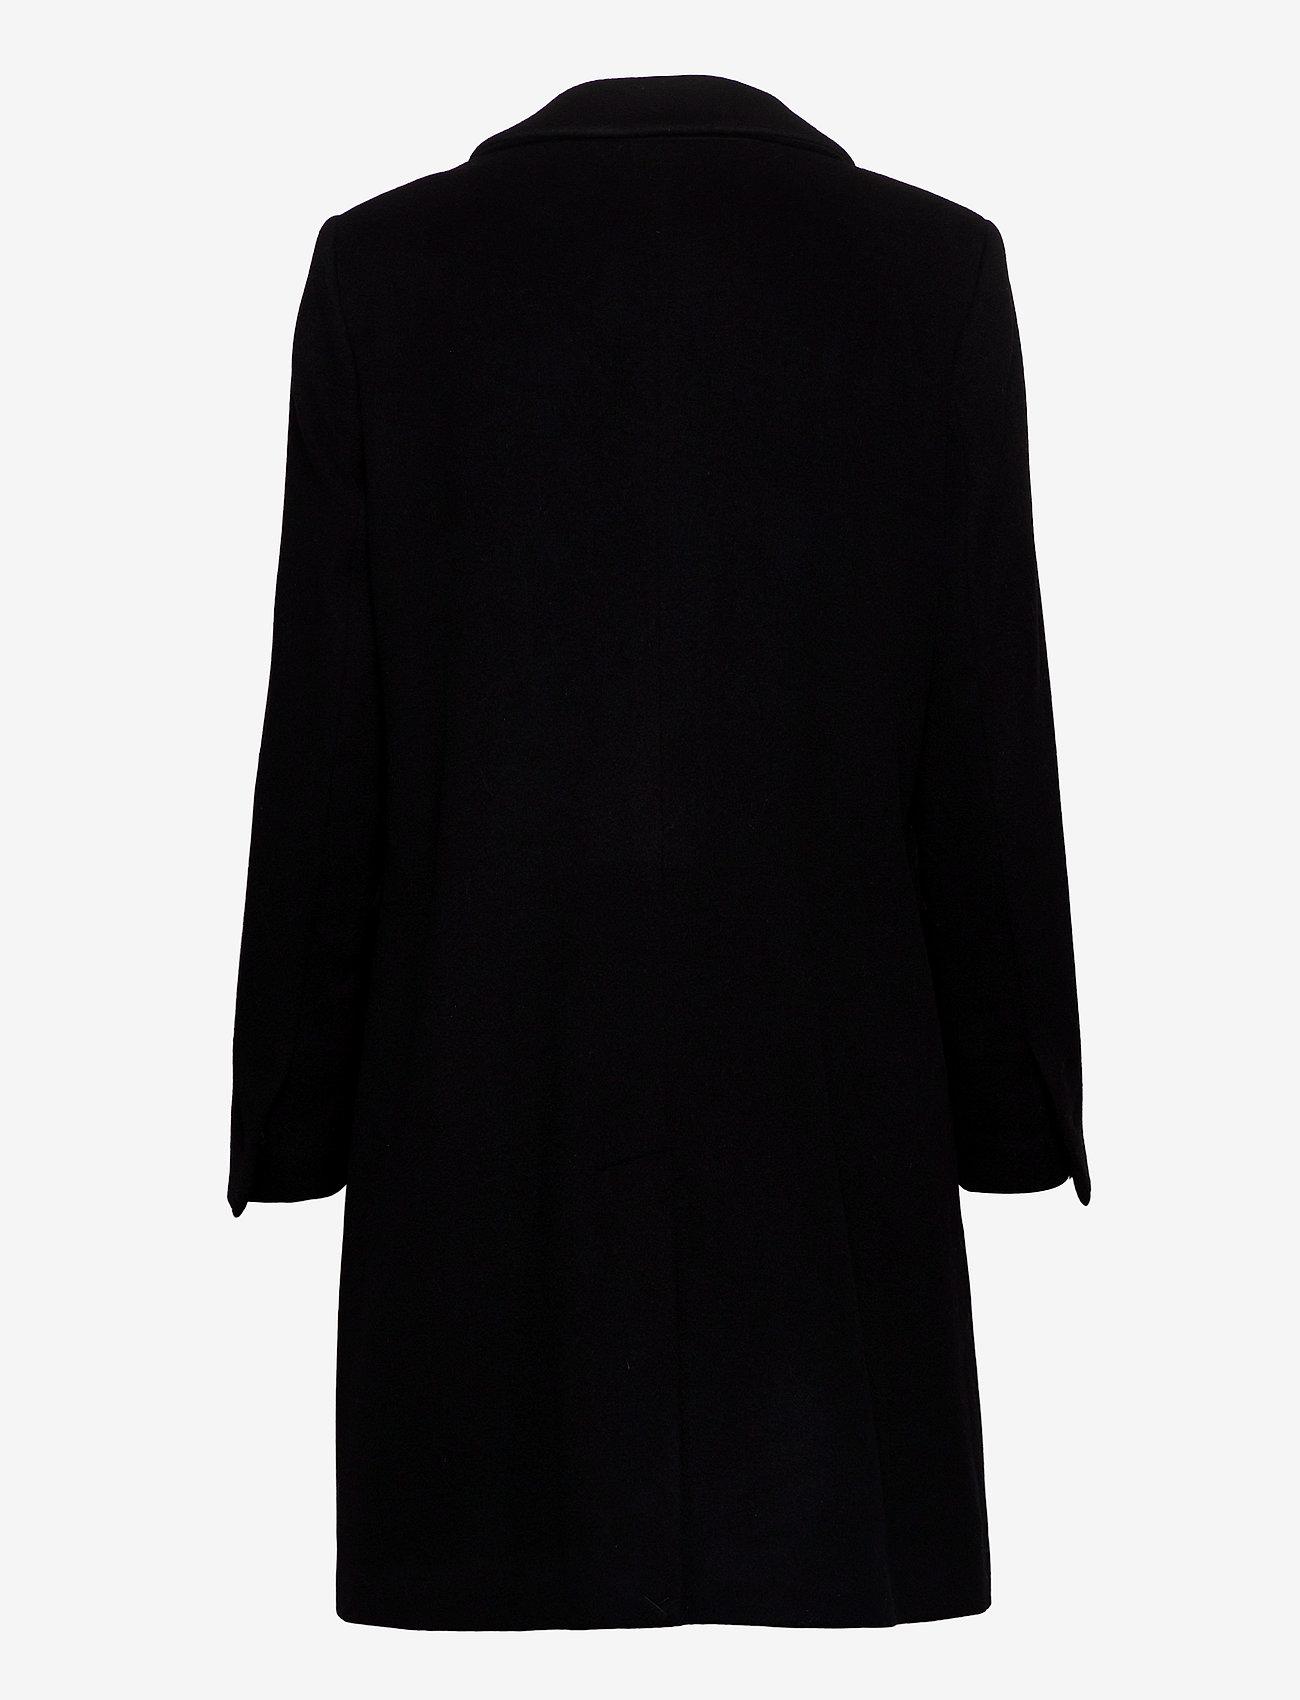 SAND - Cashmere Coat W - Britni 2 - black - 1